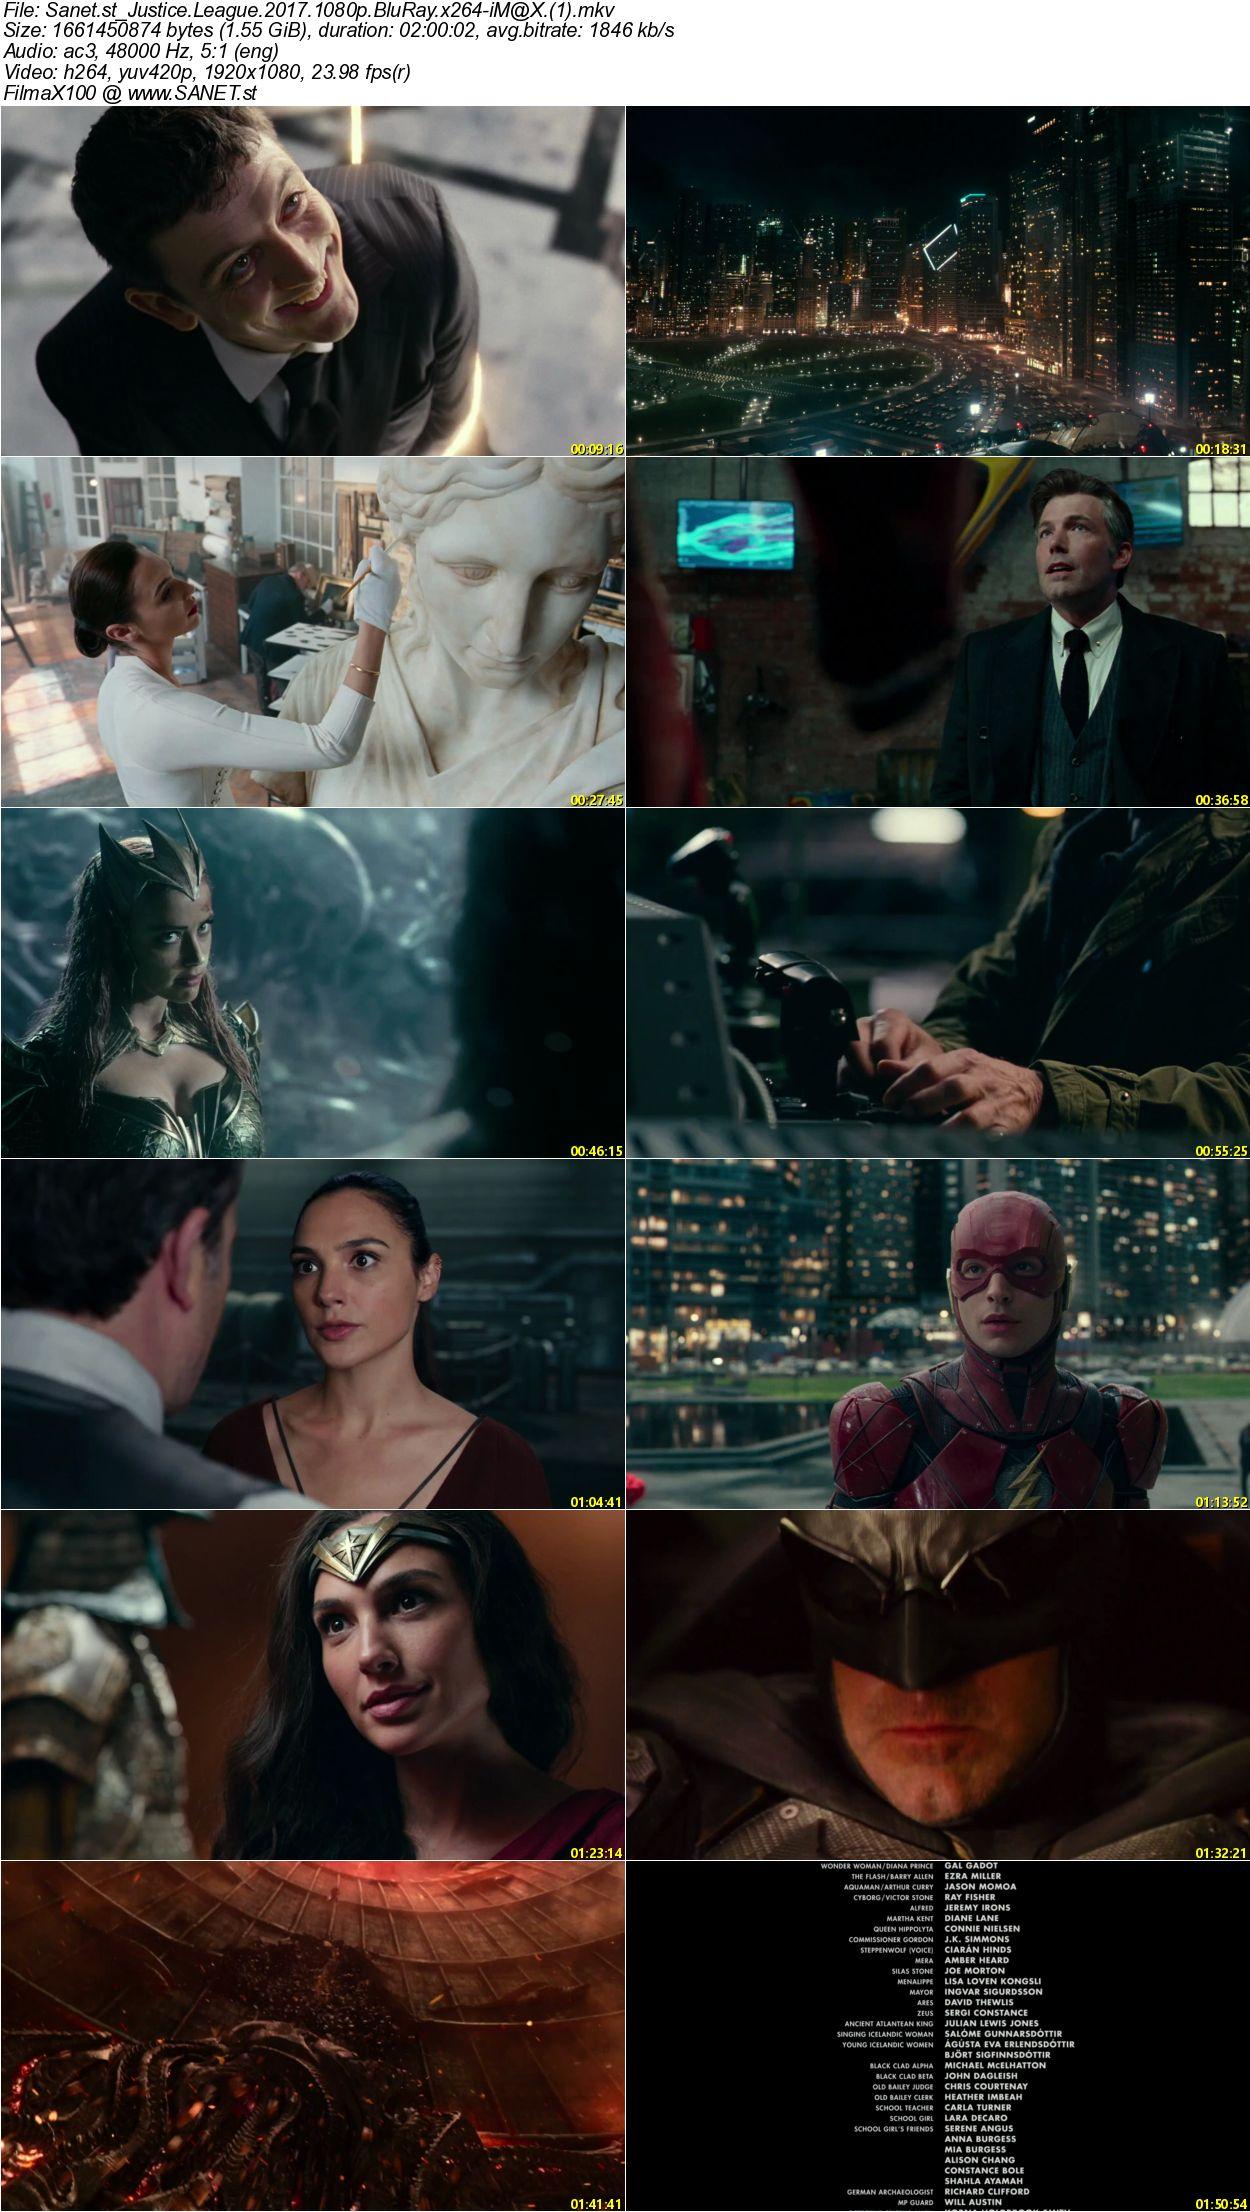 Blu Ray Vs 1080p: Download Justice League 2017 1080p BluRay X264-iM@X